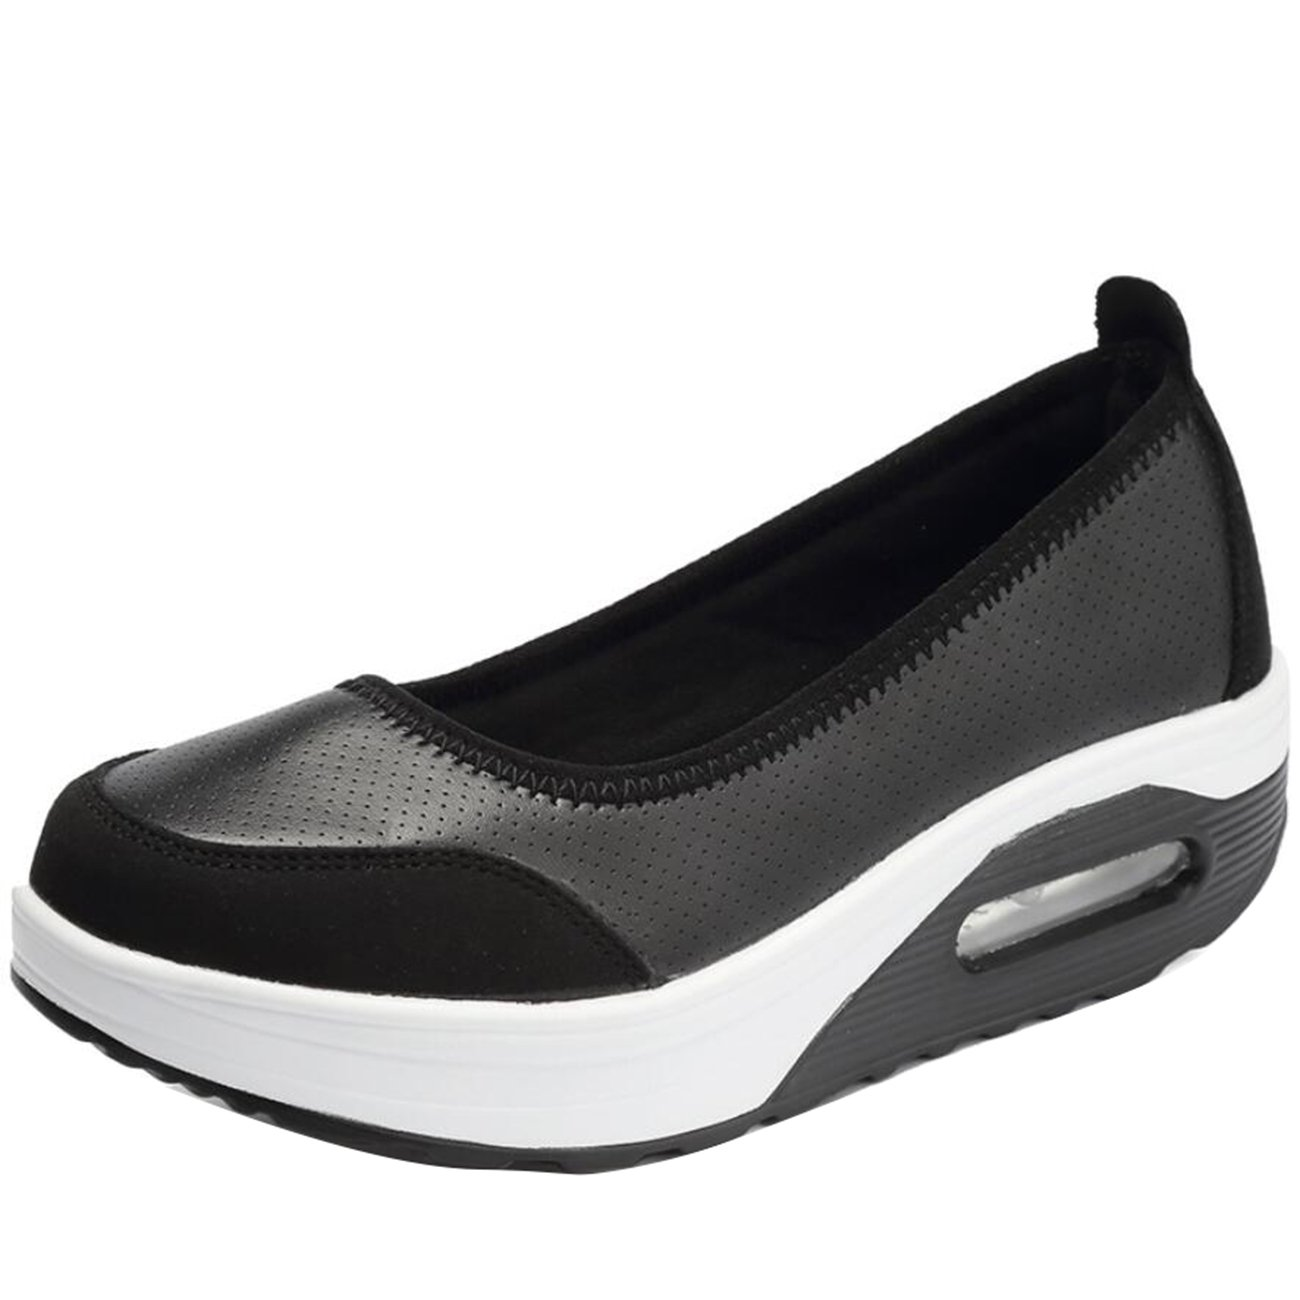 Mashiaoyi Womens Hollow Flatform Slip-On Lace Boat Shoes